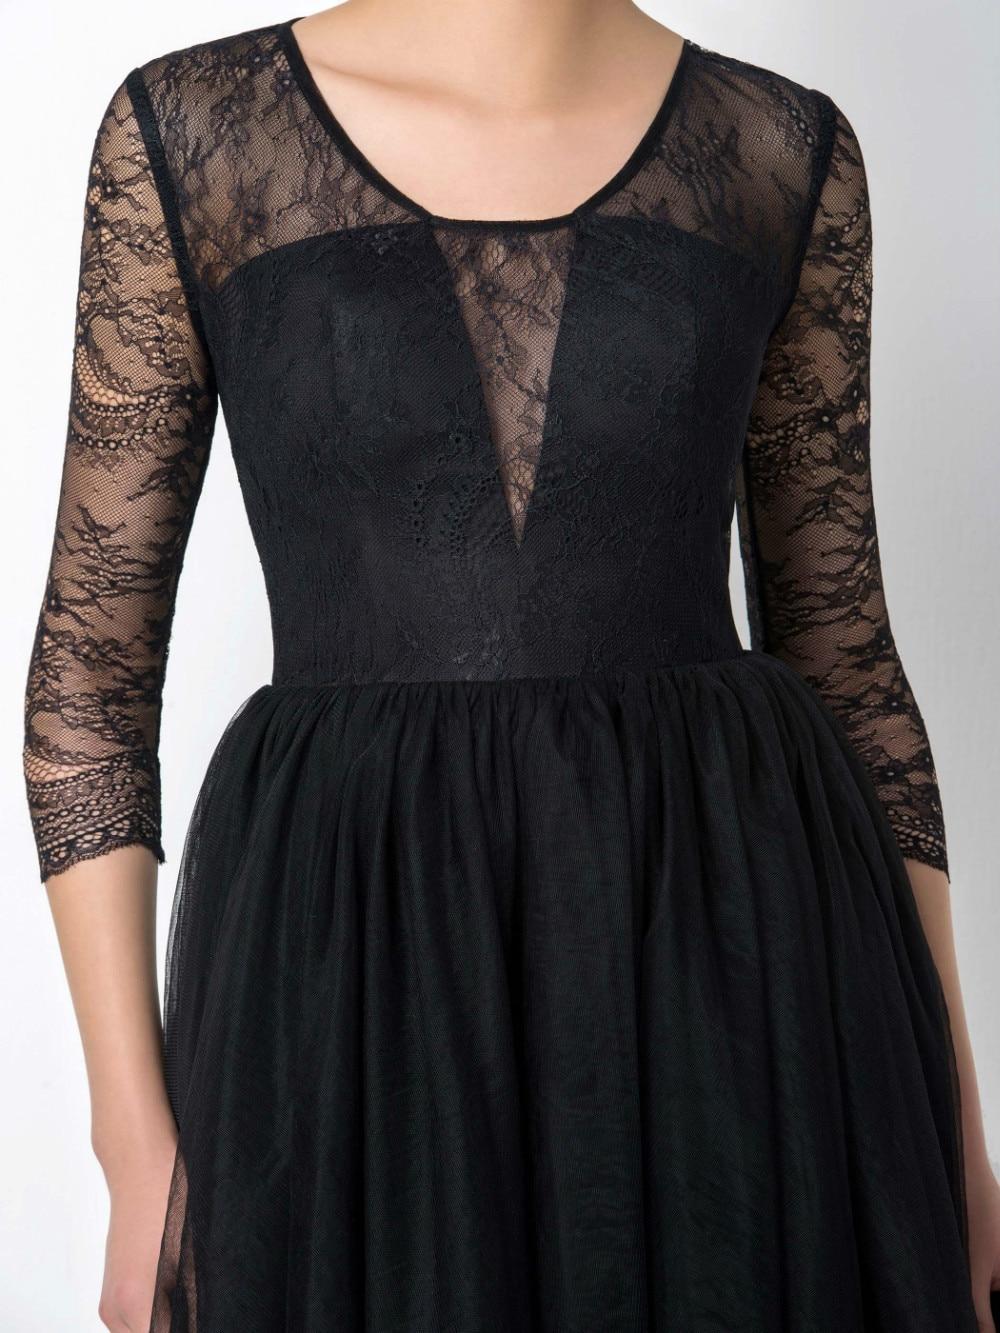 Dressv Sexy Short Black Cocktail Dresses 2017 Tulle A Line Sheer ...